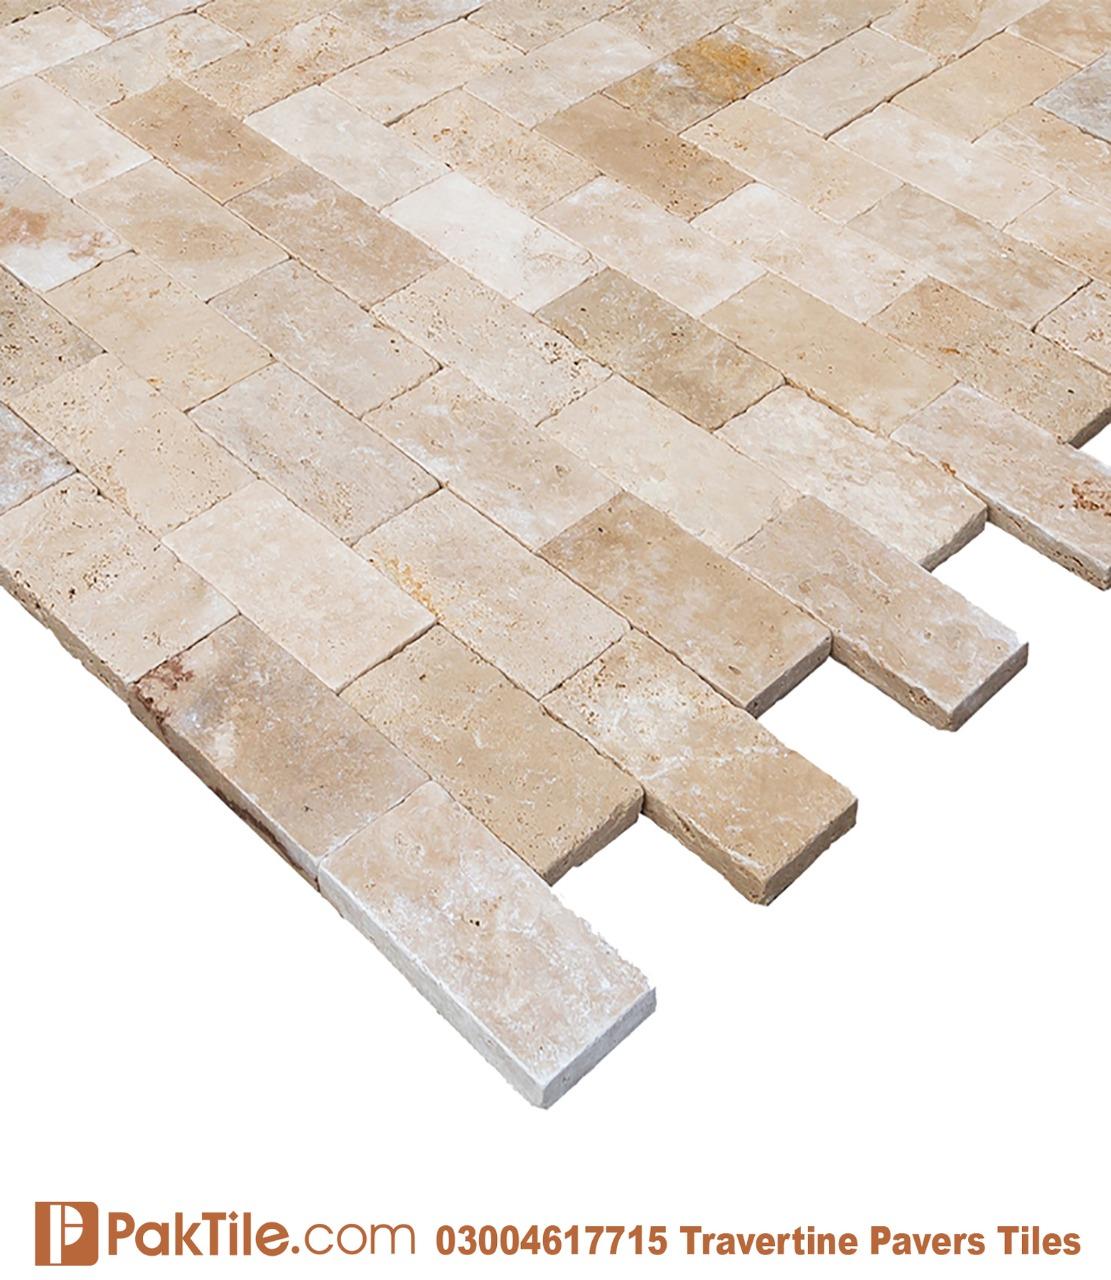 Pak Tiles Travertine Paver Tiles Slab Textures